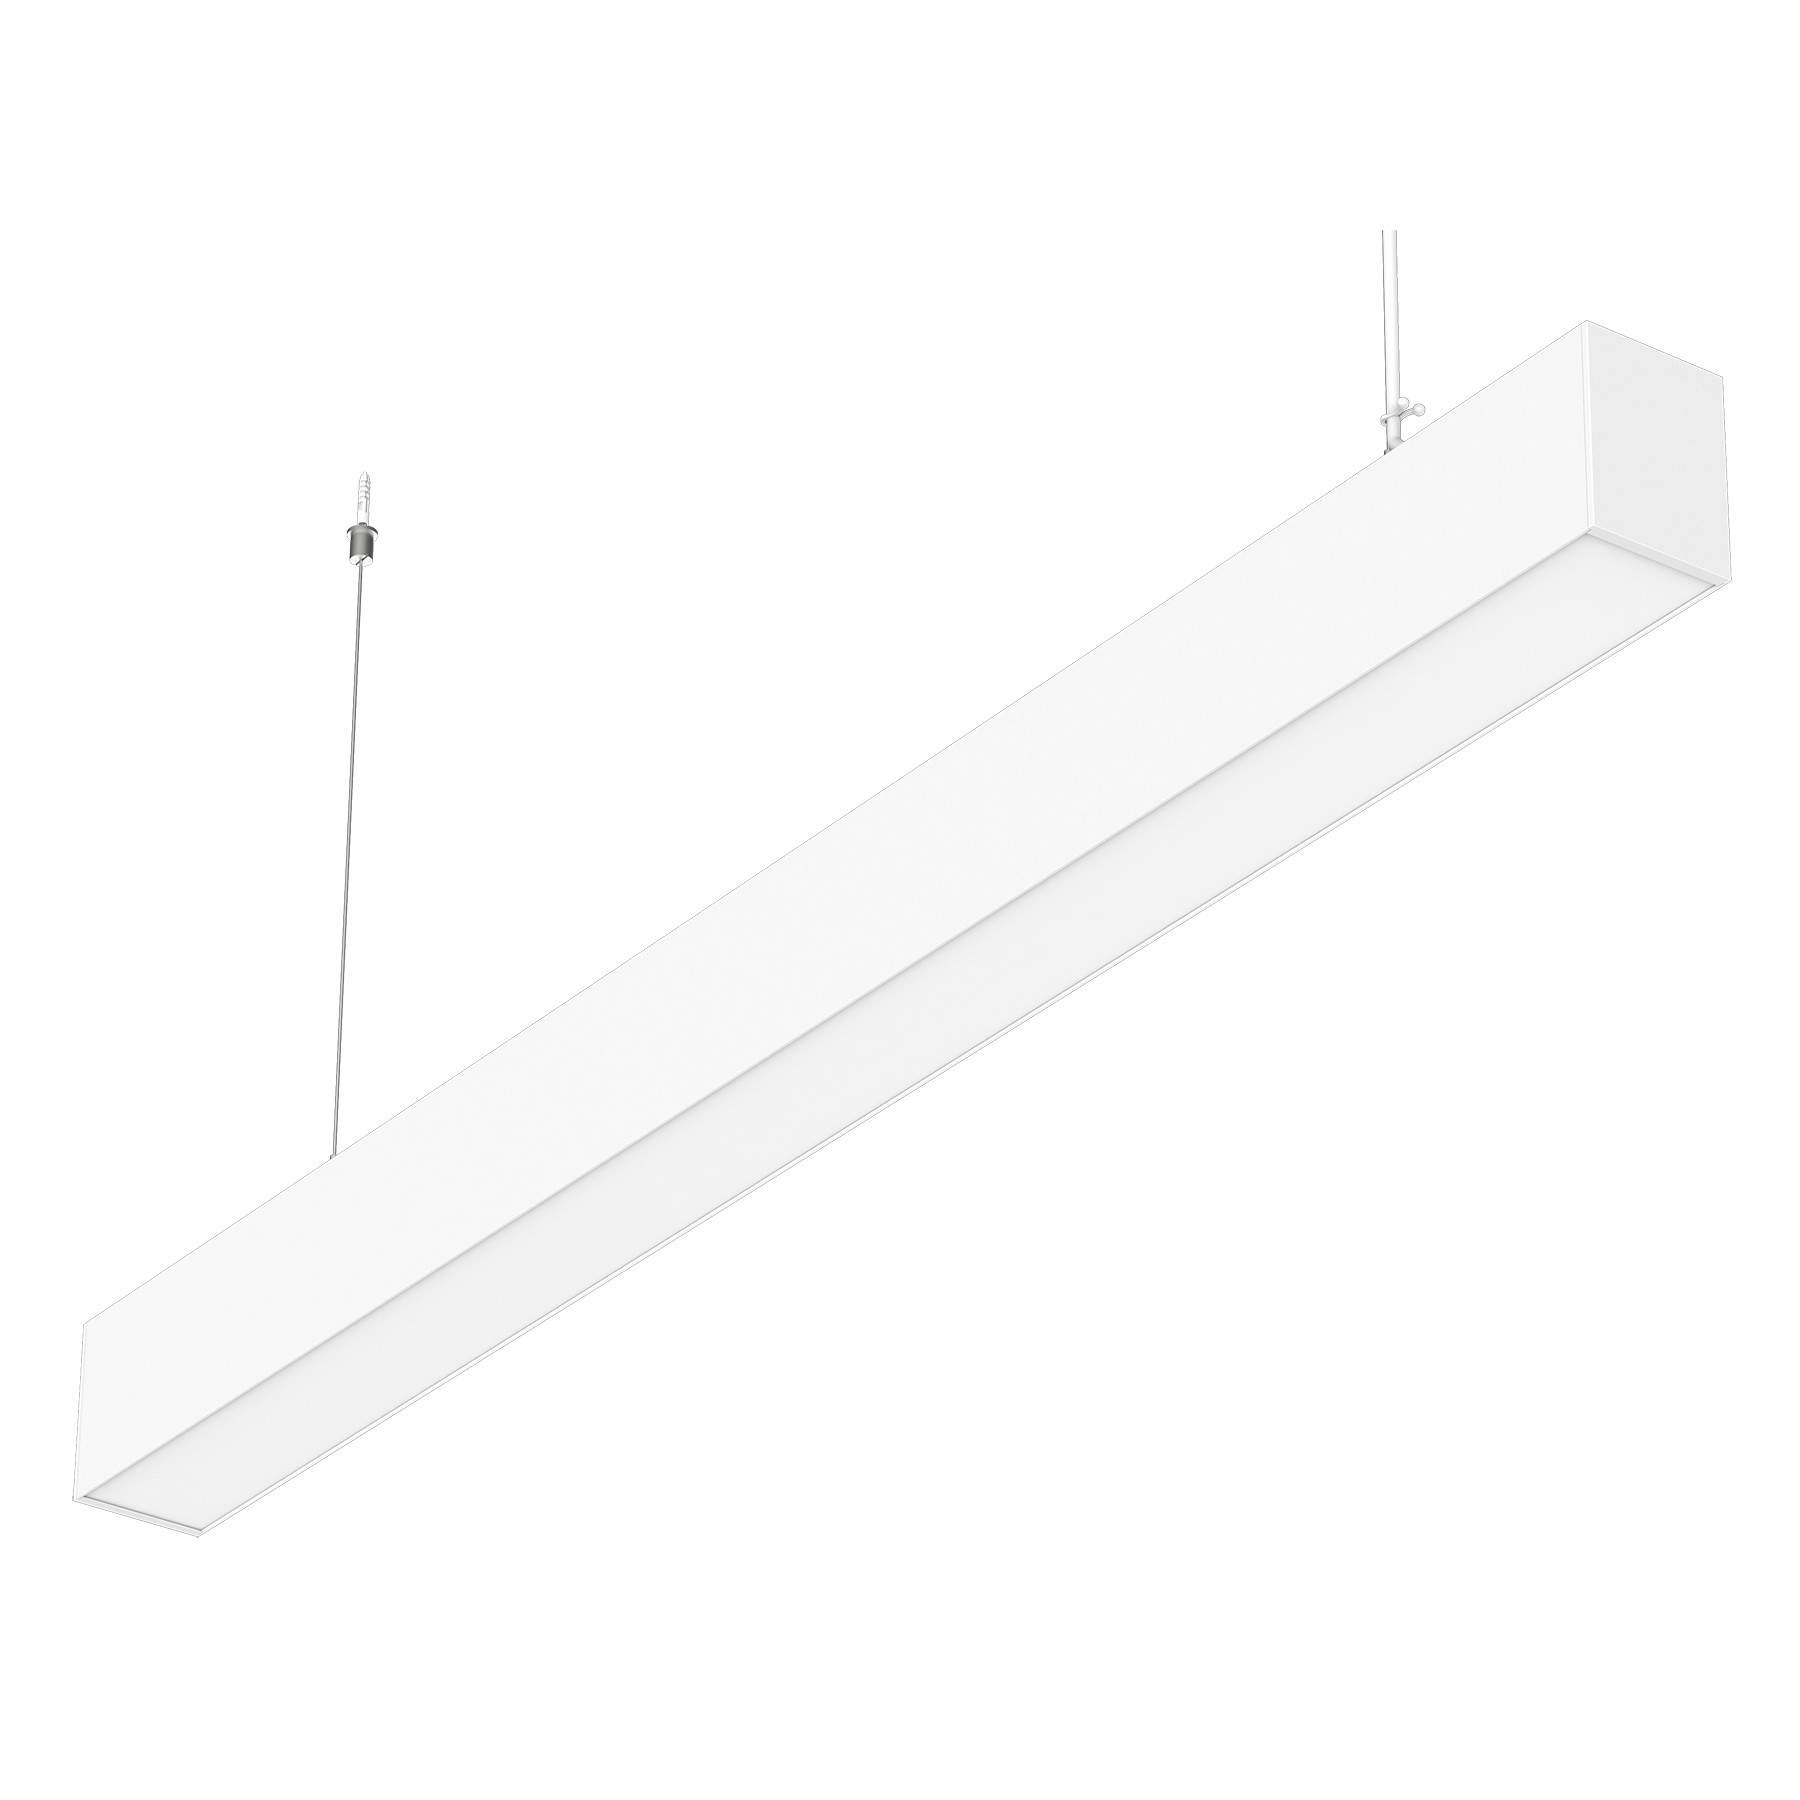 LED ceiling light LED ceiling light PROLUMEN DB45B (OPAL) 1200 white  40W 4500lm CRI80  100° IP20 3000K, 4000K, 6000K WW/DW/CW